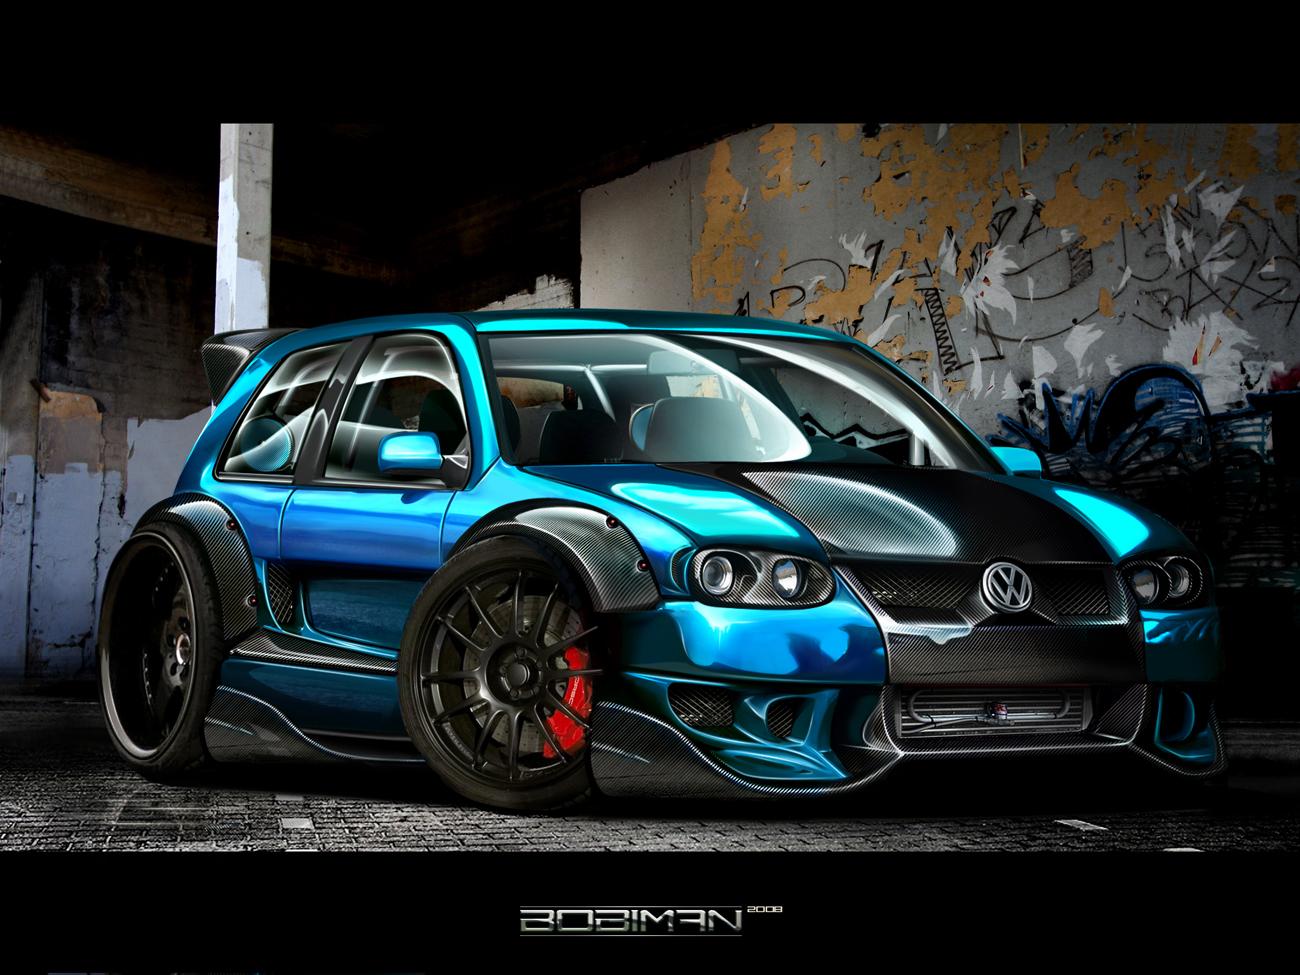 Auto Sport 2011: Sports Car Wallpapers Hd